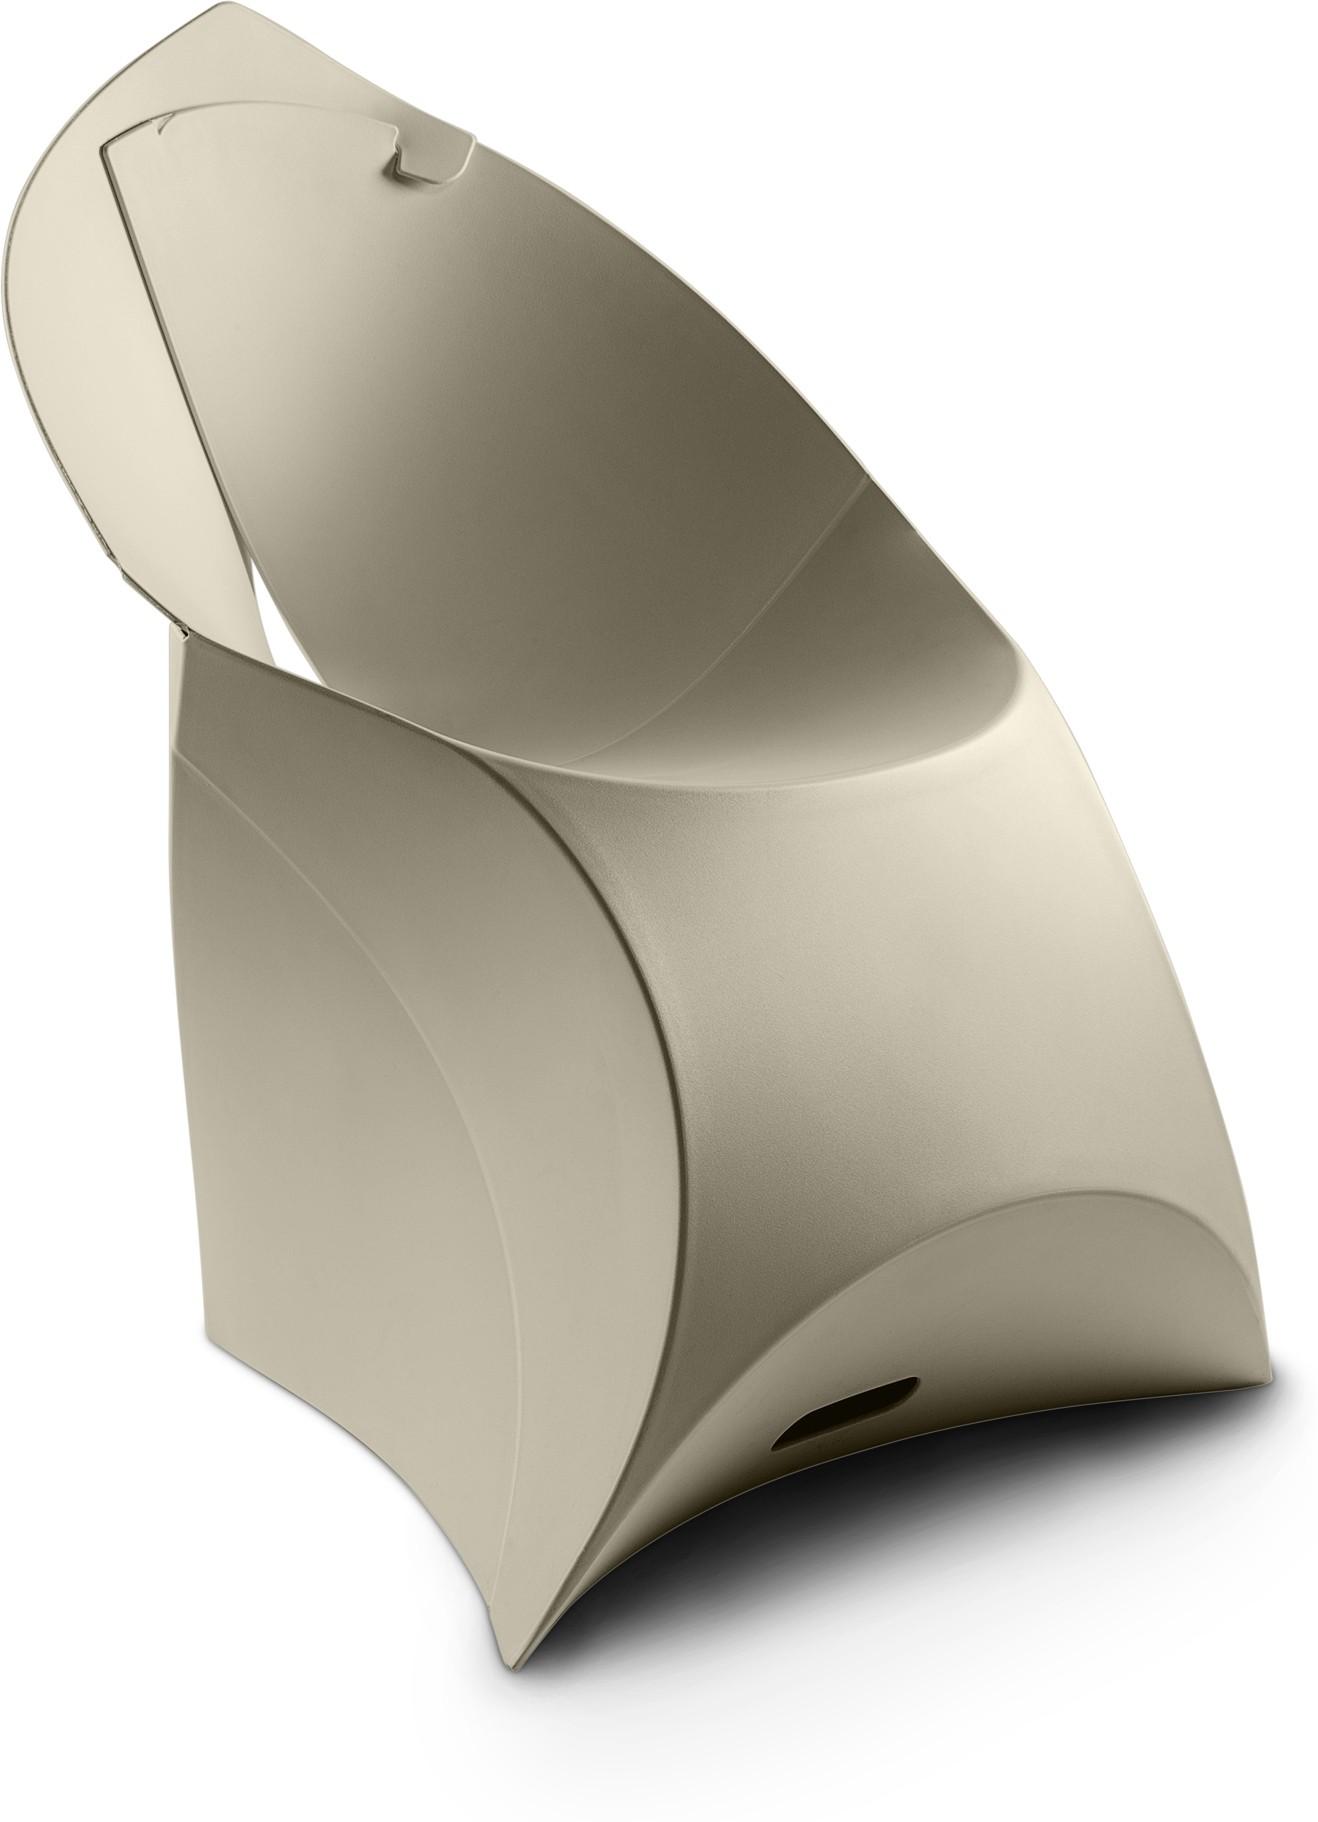 View Flux Plastic Living Room Chair(Finish Color - Pebble Grey) Furniture (Flux)